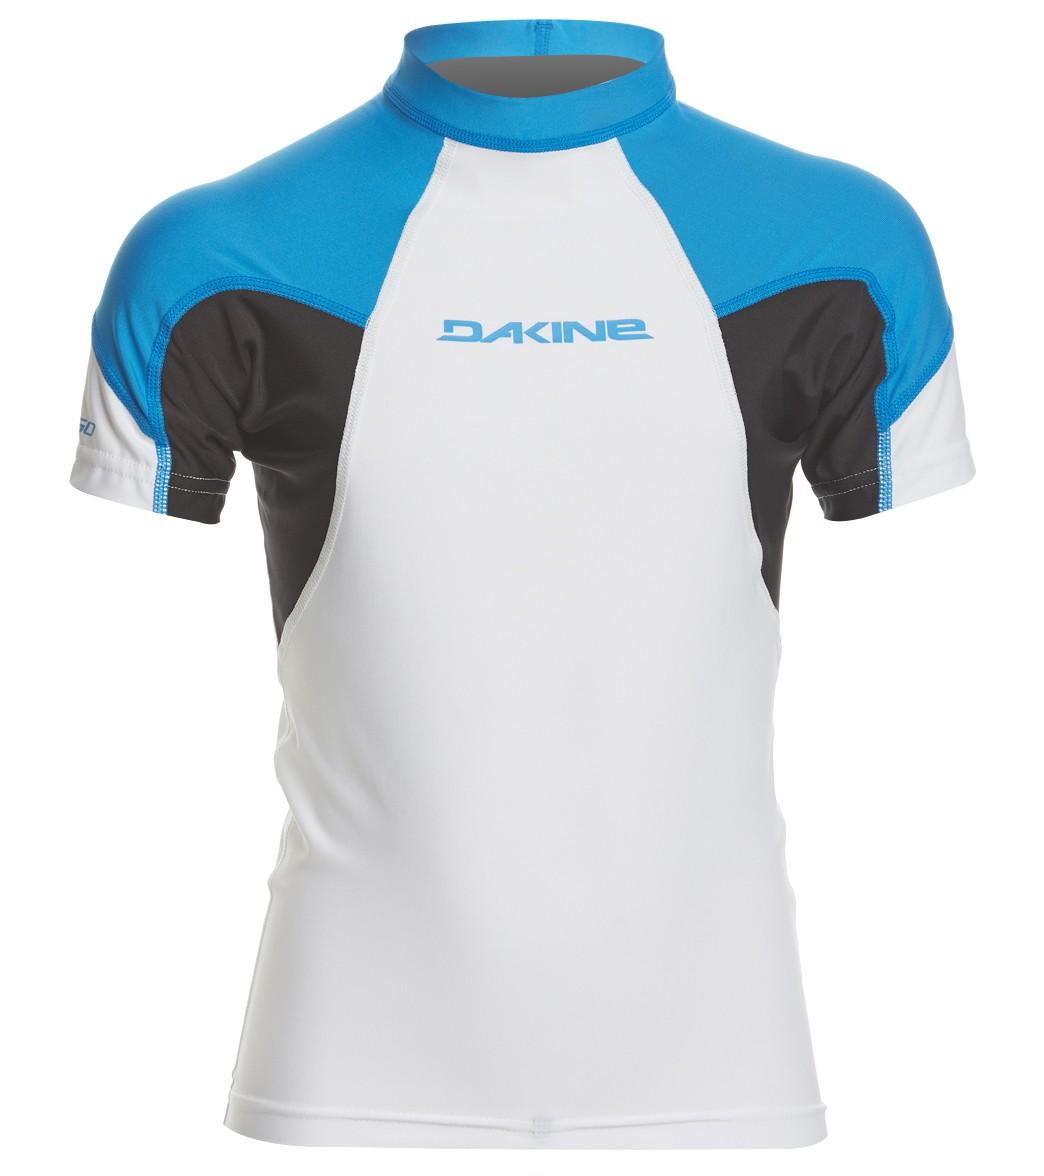 e2aaeb5bb5 Dakine Boys' Heavy Duty Snug Fit Short Sleeve Rashguard at SwimOutlet.com